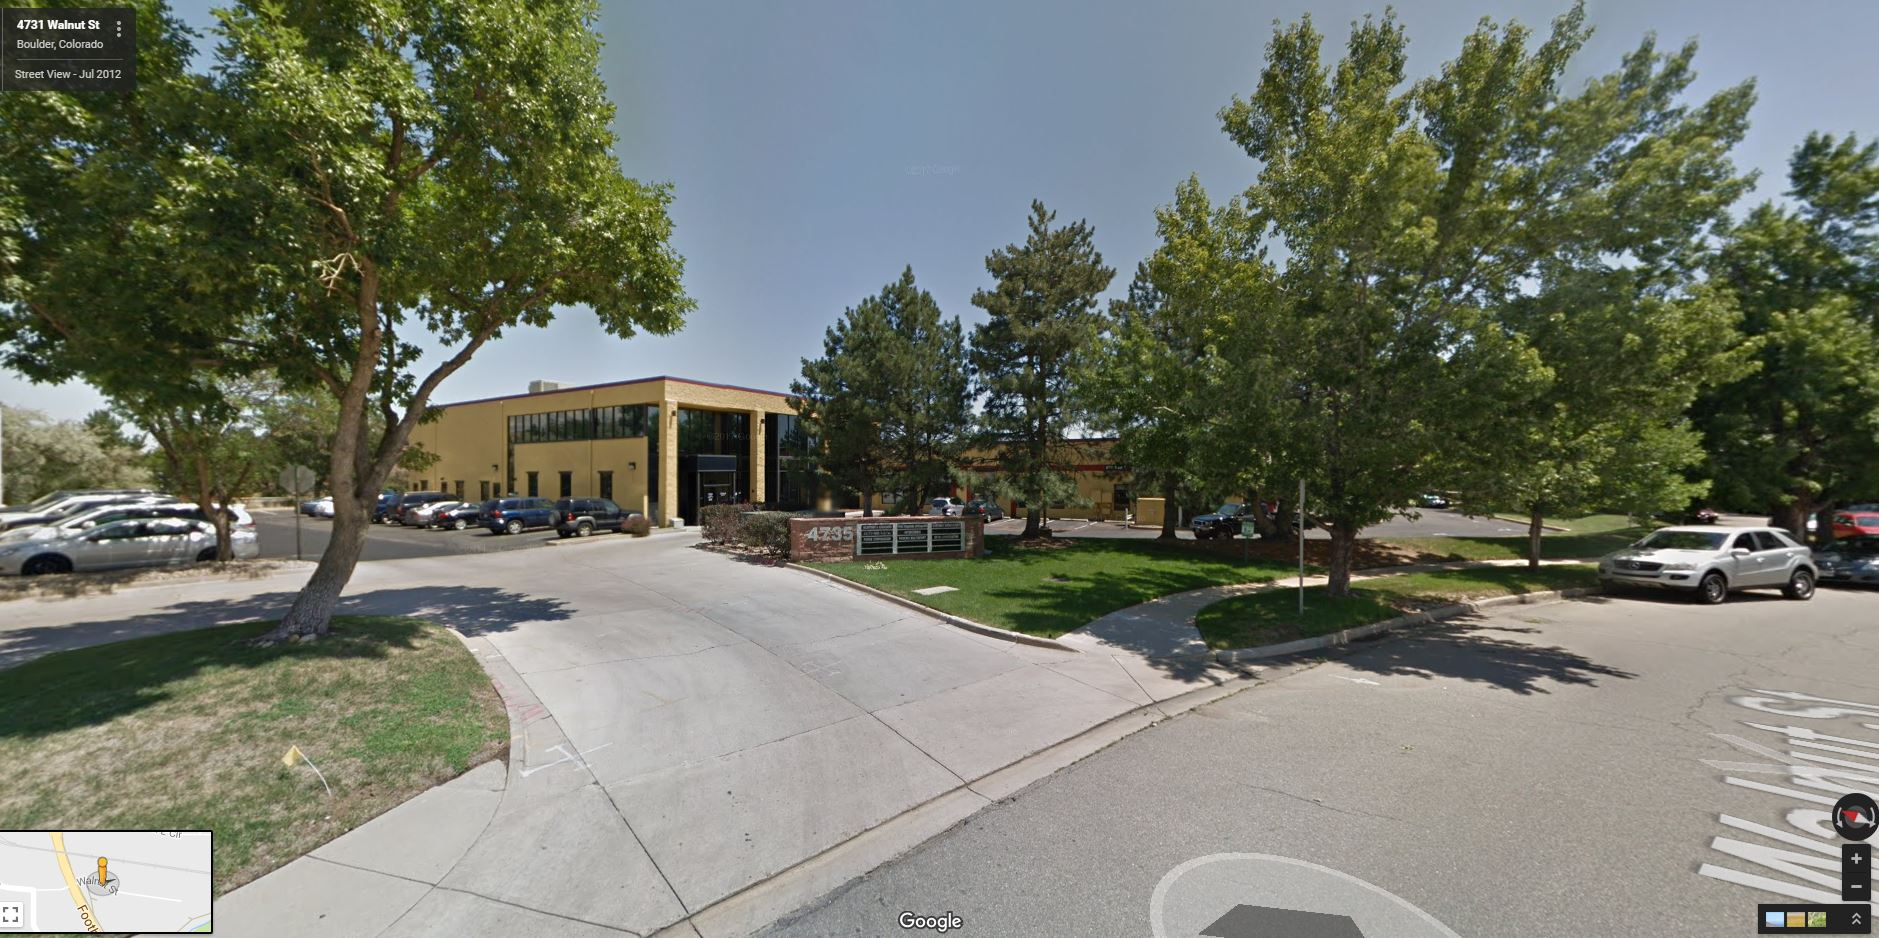 front street elevation -4731 Walnut St - Google Maps.jpg